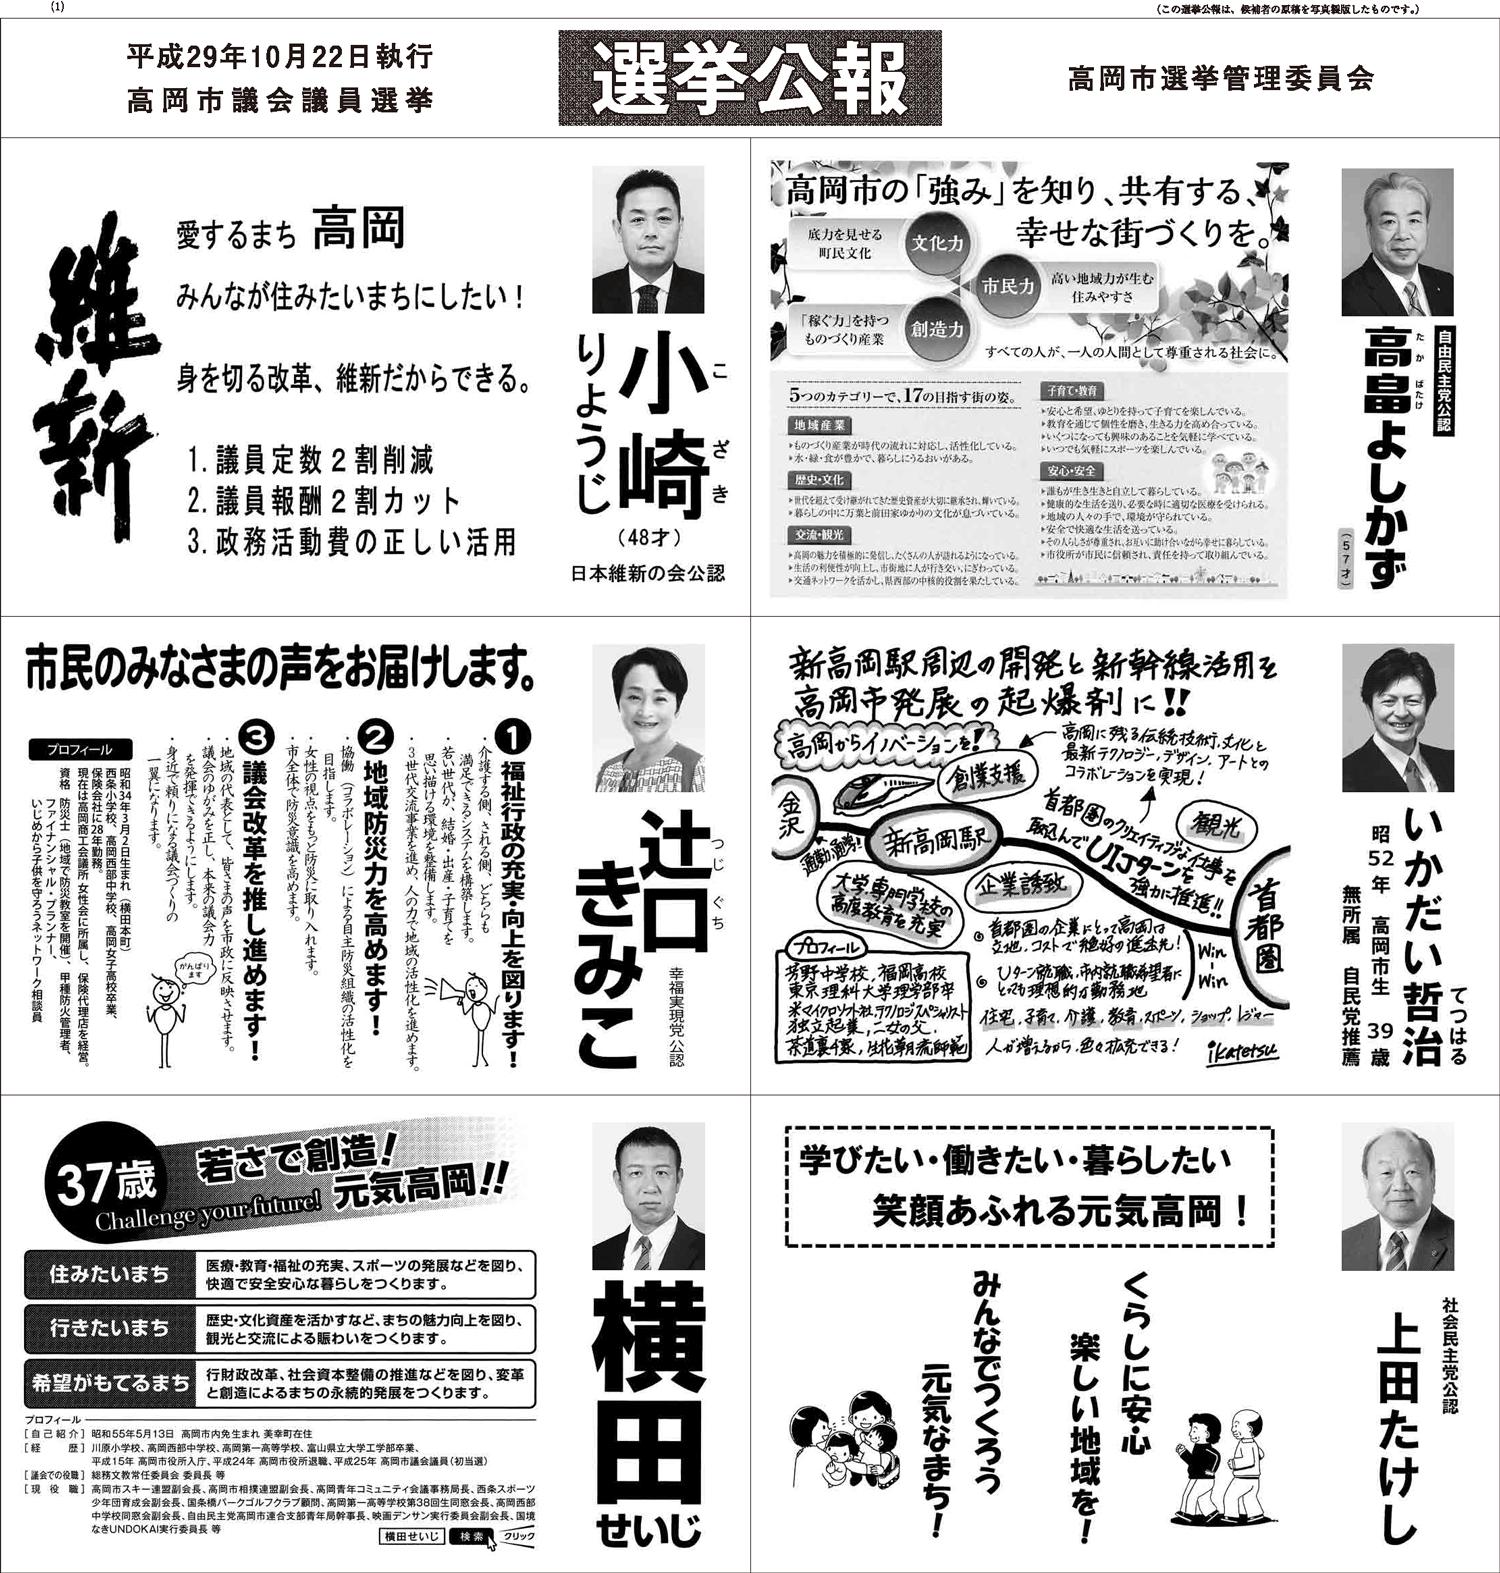 高岡市議会議員選挙2017の選挙公報1